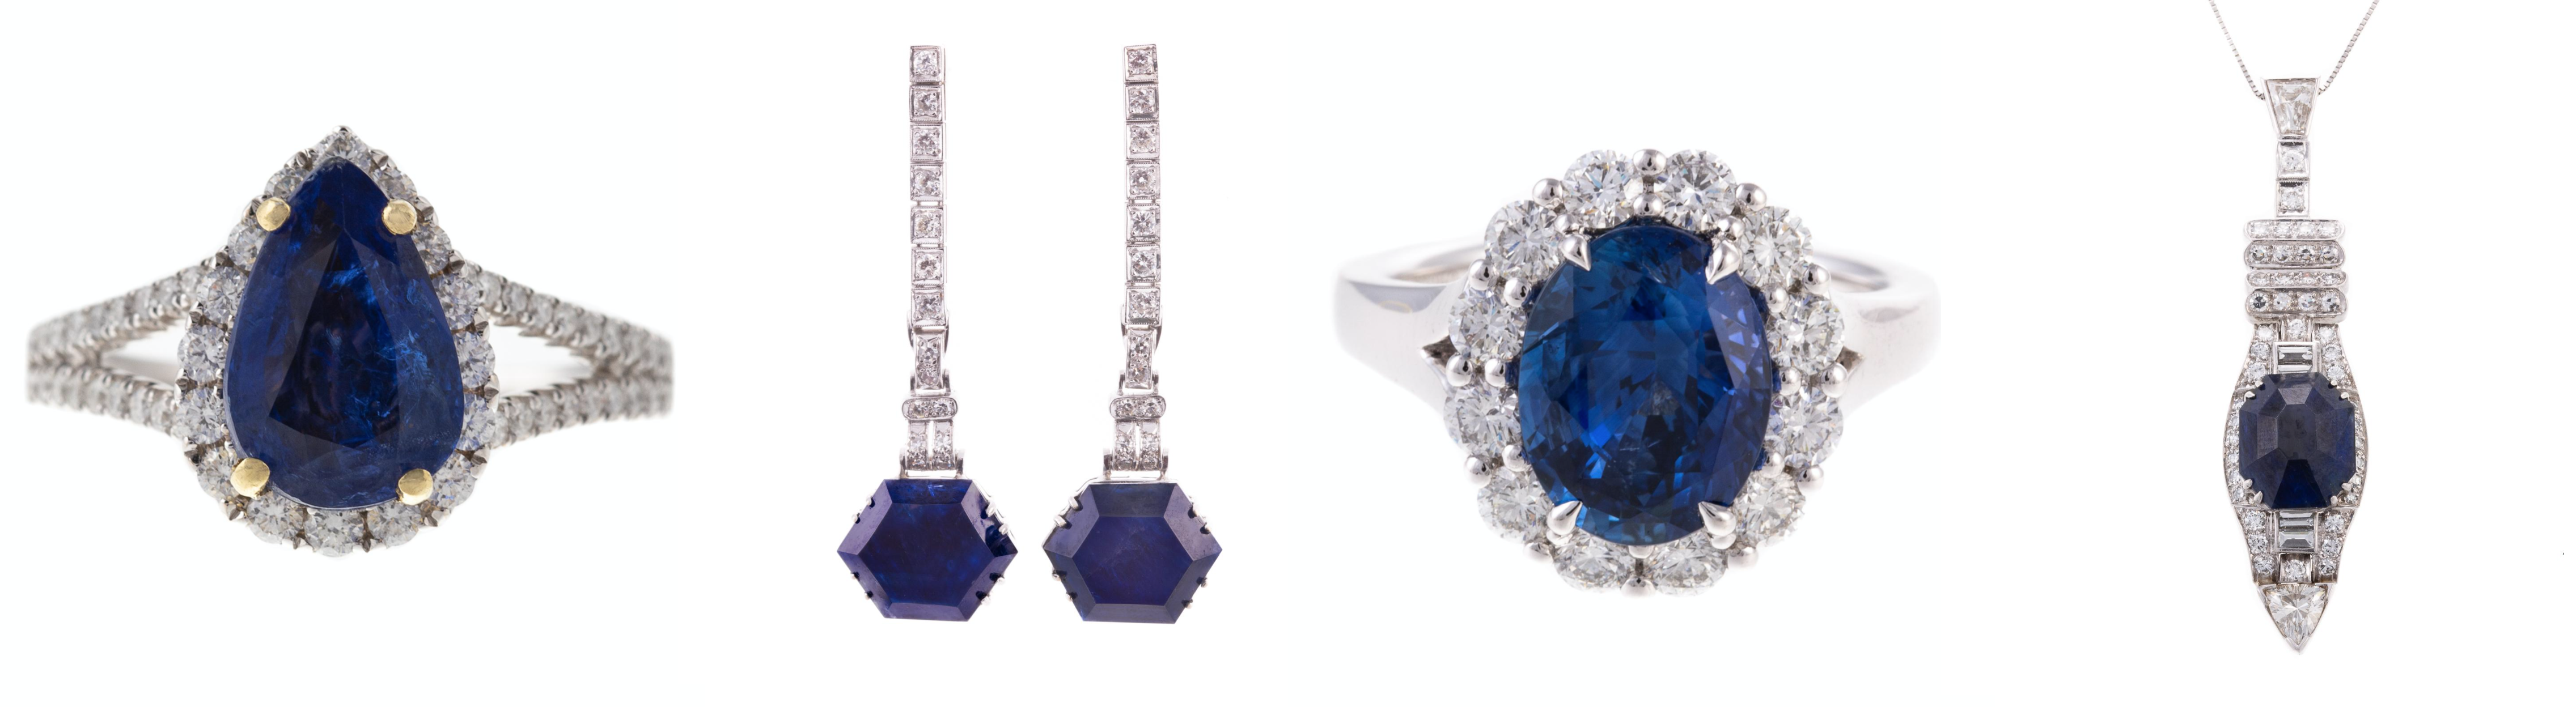 Legendary Sapphires & Their Origins